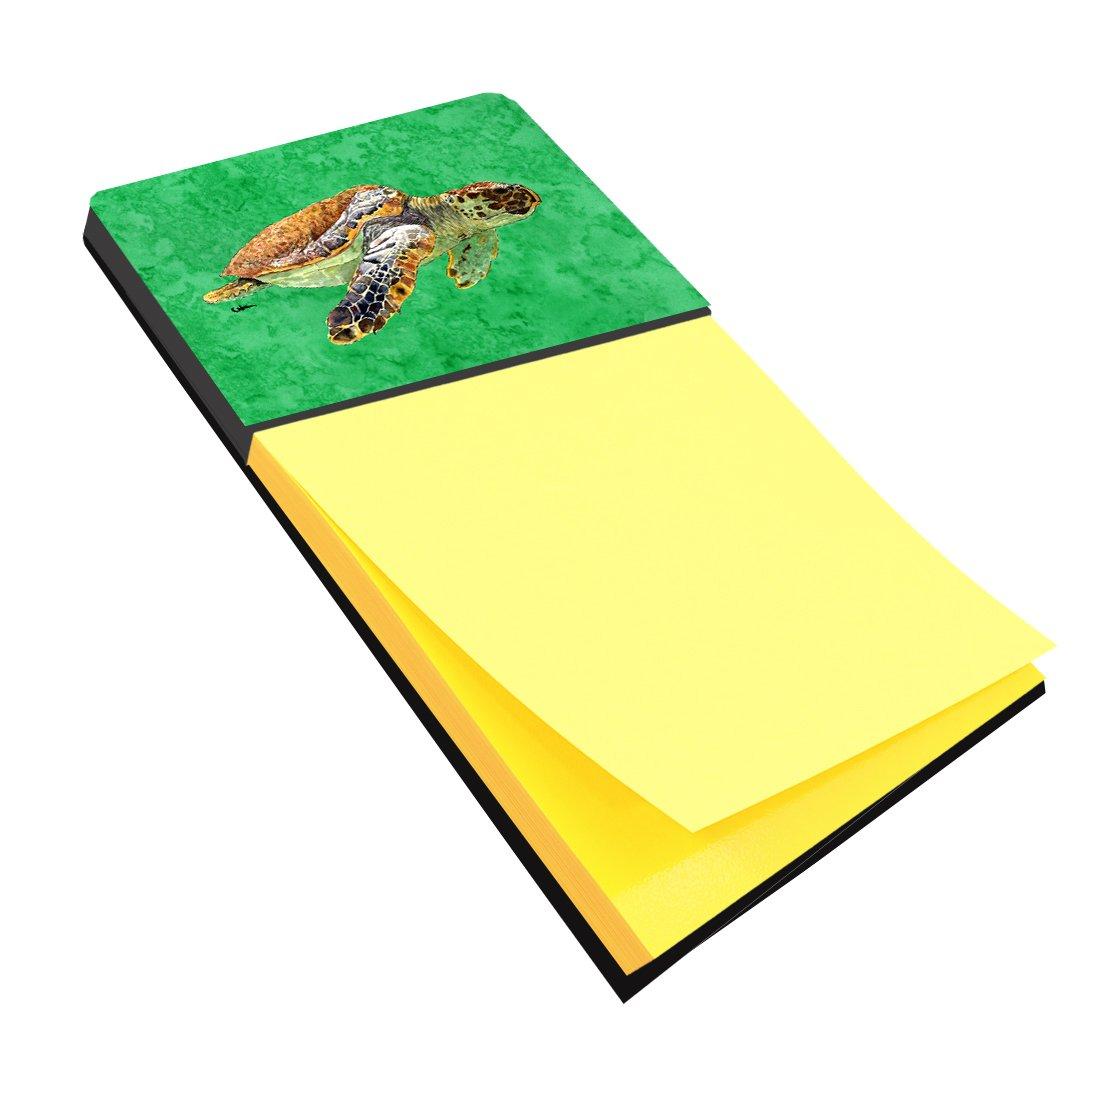 Caroline's Treasures 8675SN Turtle Refiillable Sticky Note Holder or Postit Note Dispenser, Large, Multicolor